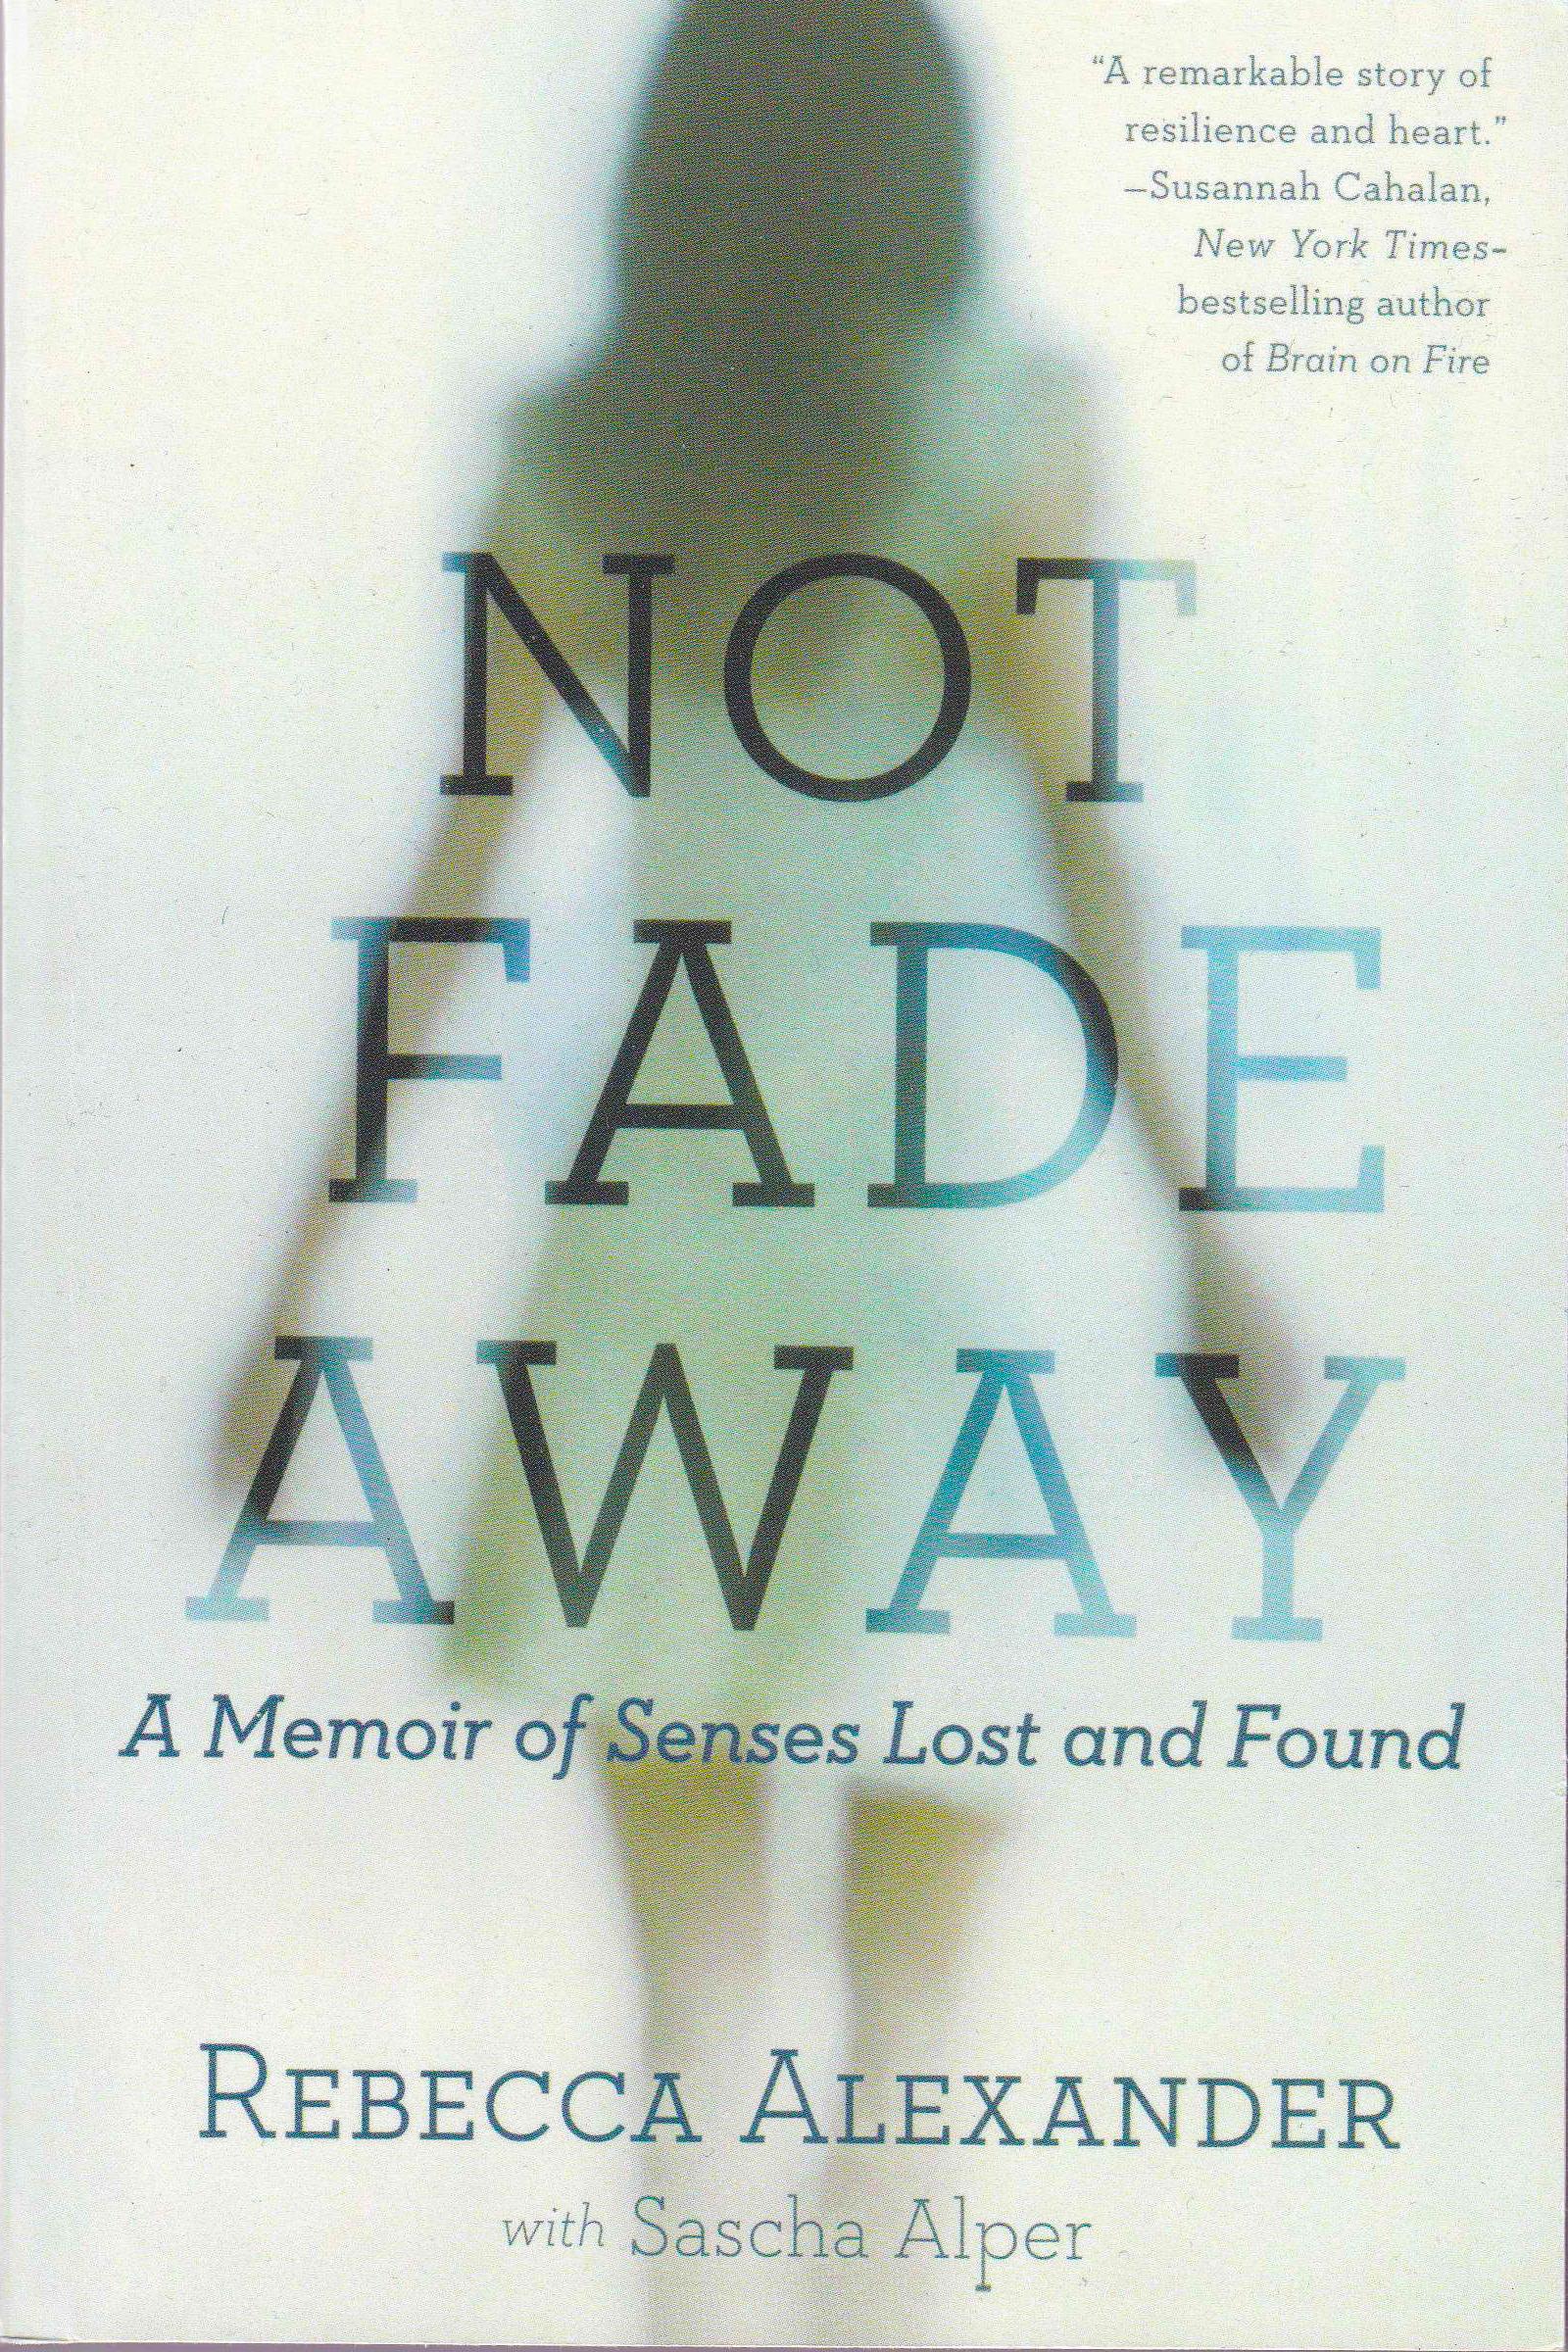 A memoir of senses lost and found